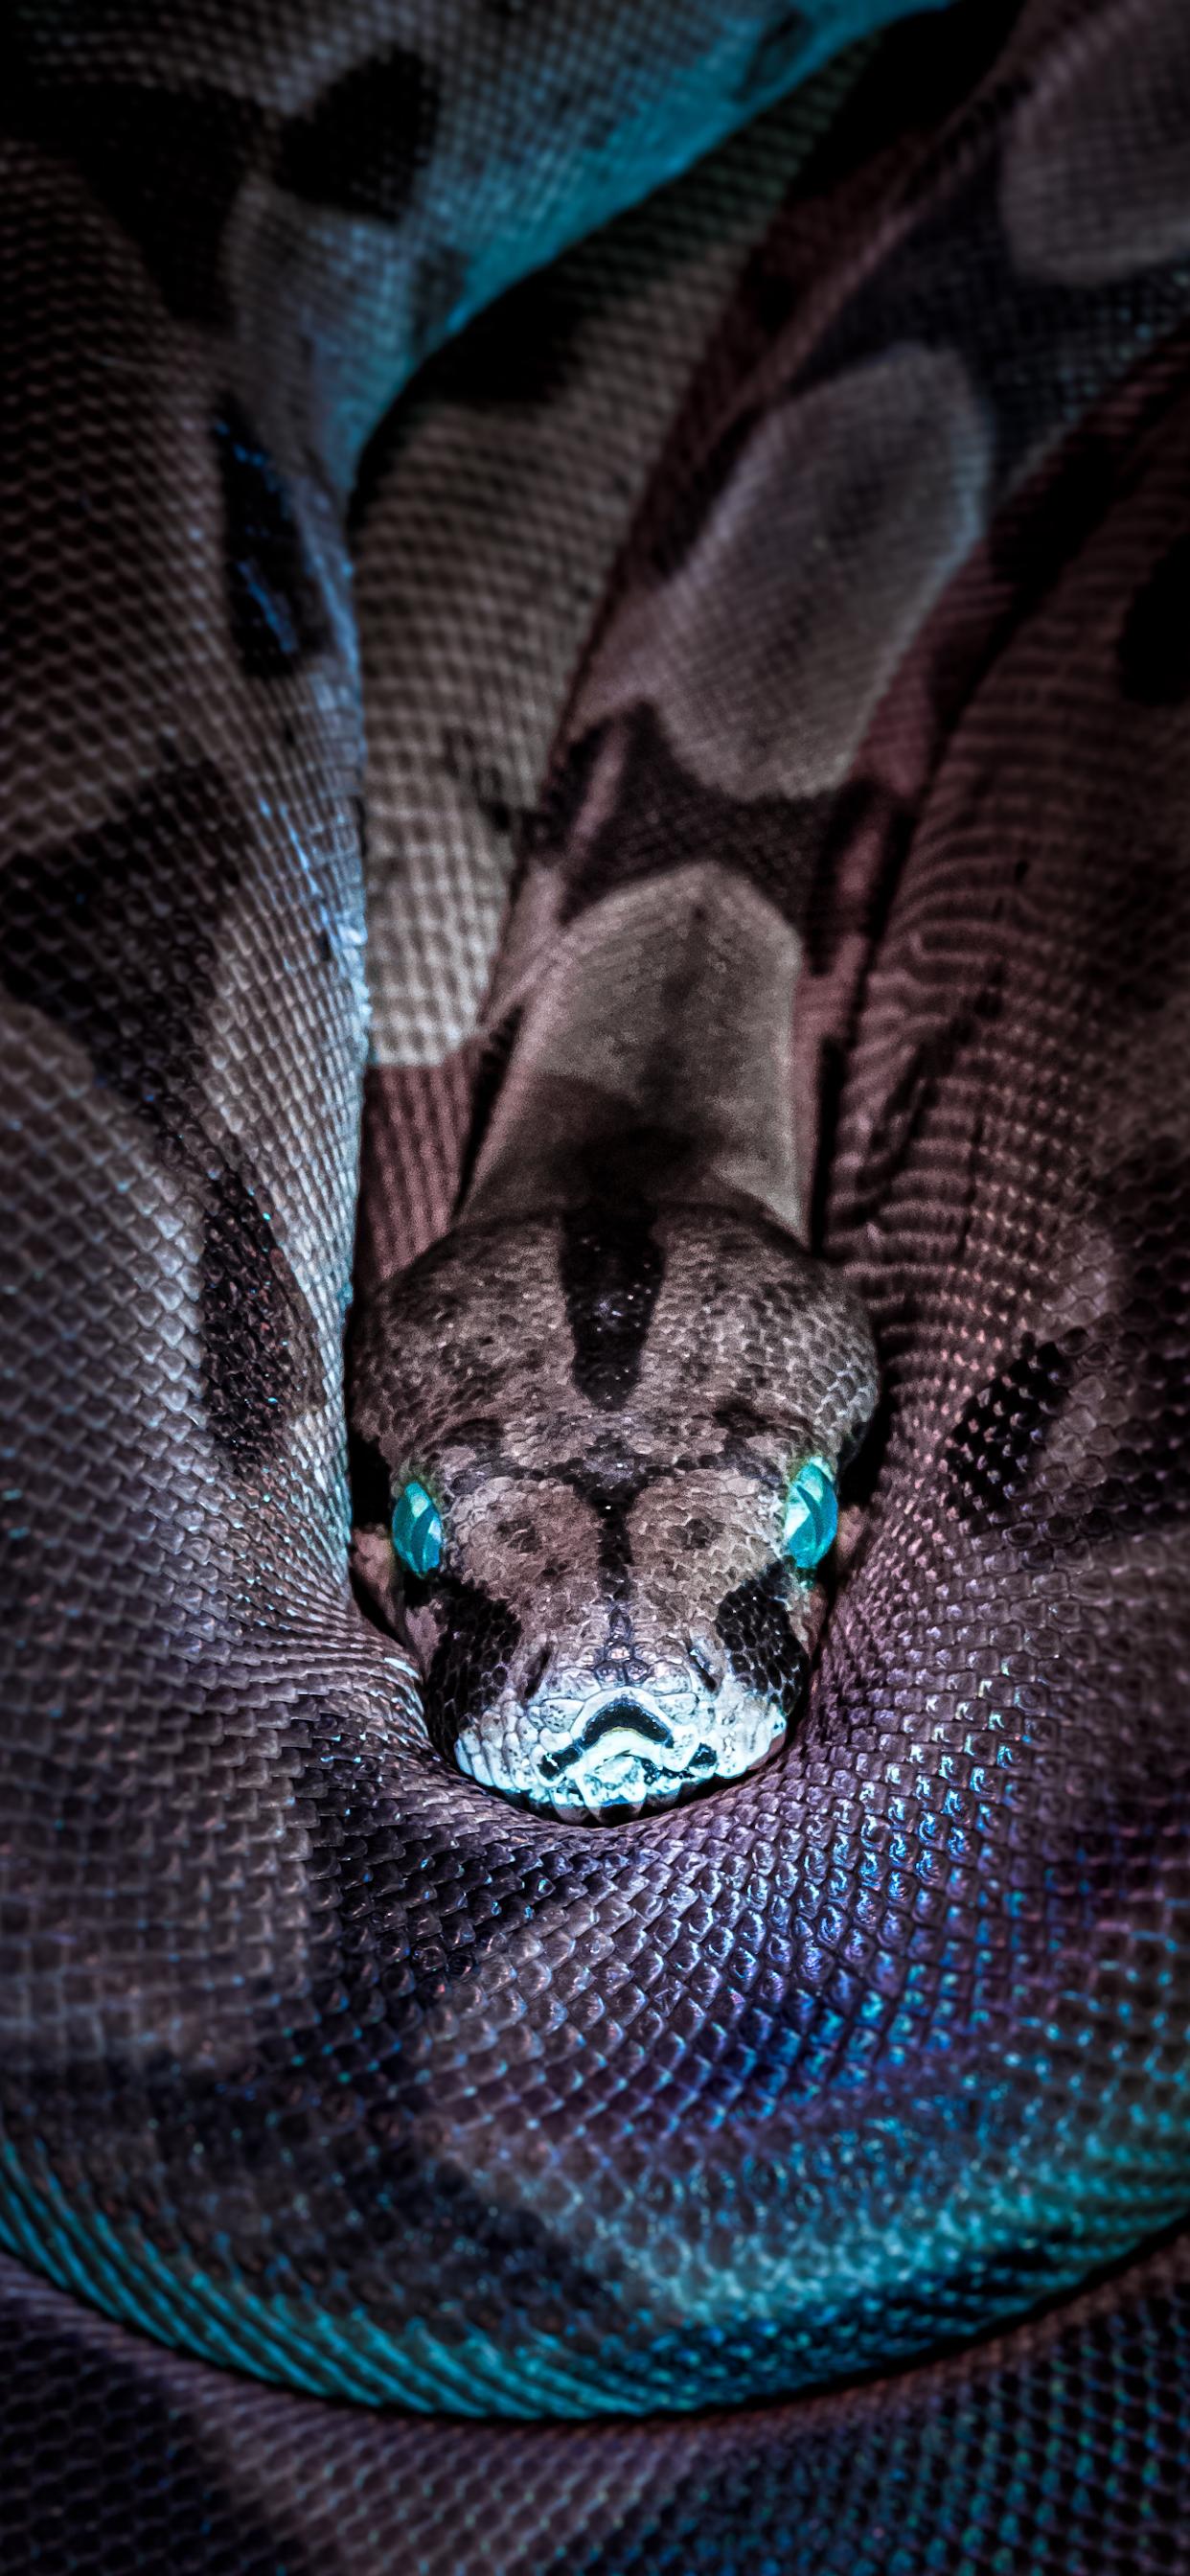 iPhone wallpapers snake blue eyes Fonds d'écran iPhone du 22/10/2019